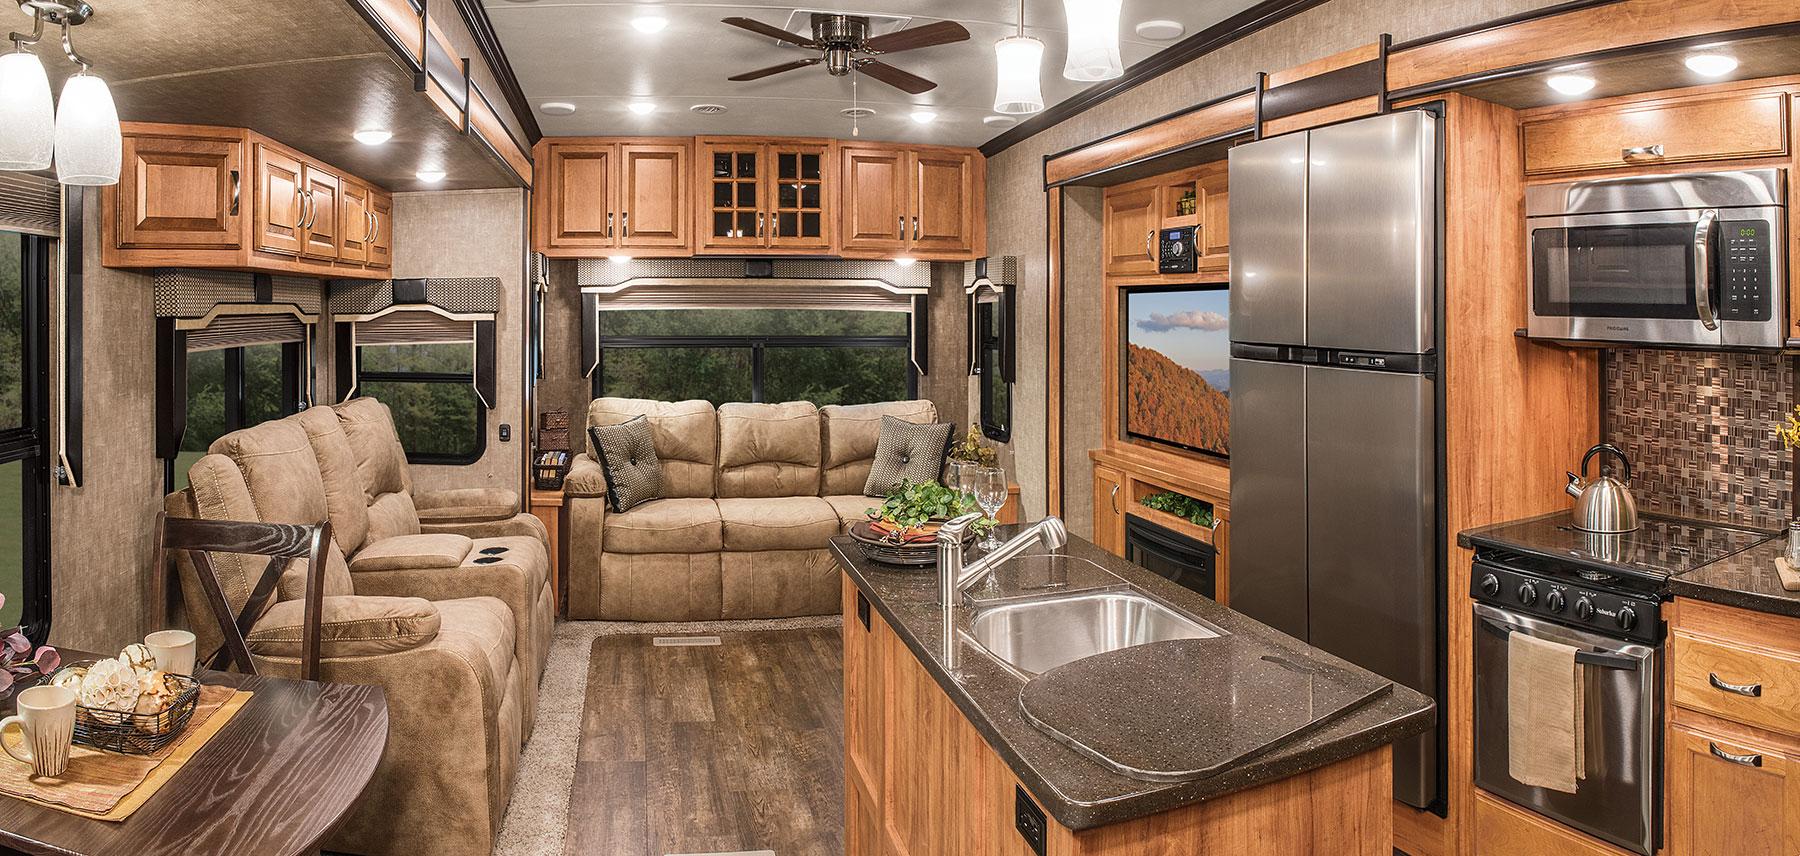 2016 Durango Gold G366fbt Fulltime Luxury Fifth Wheel K Z Rv